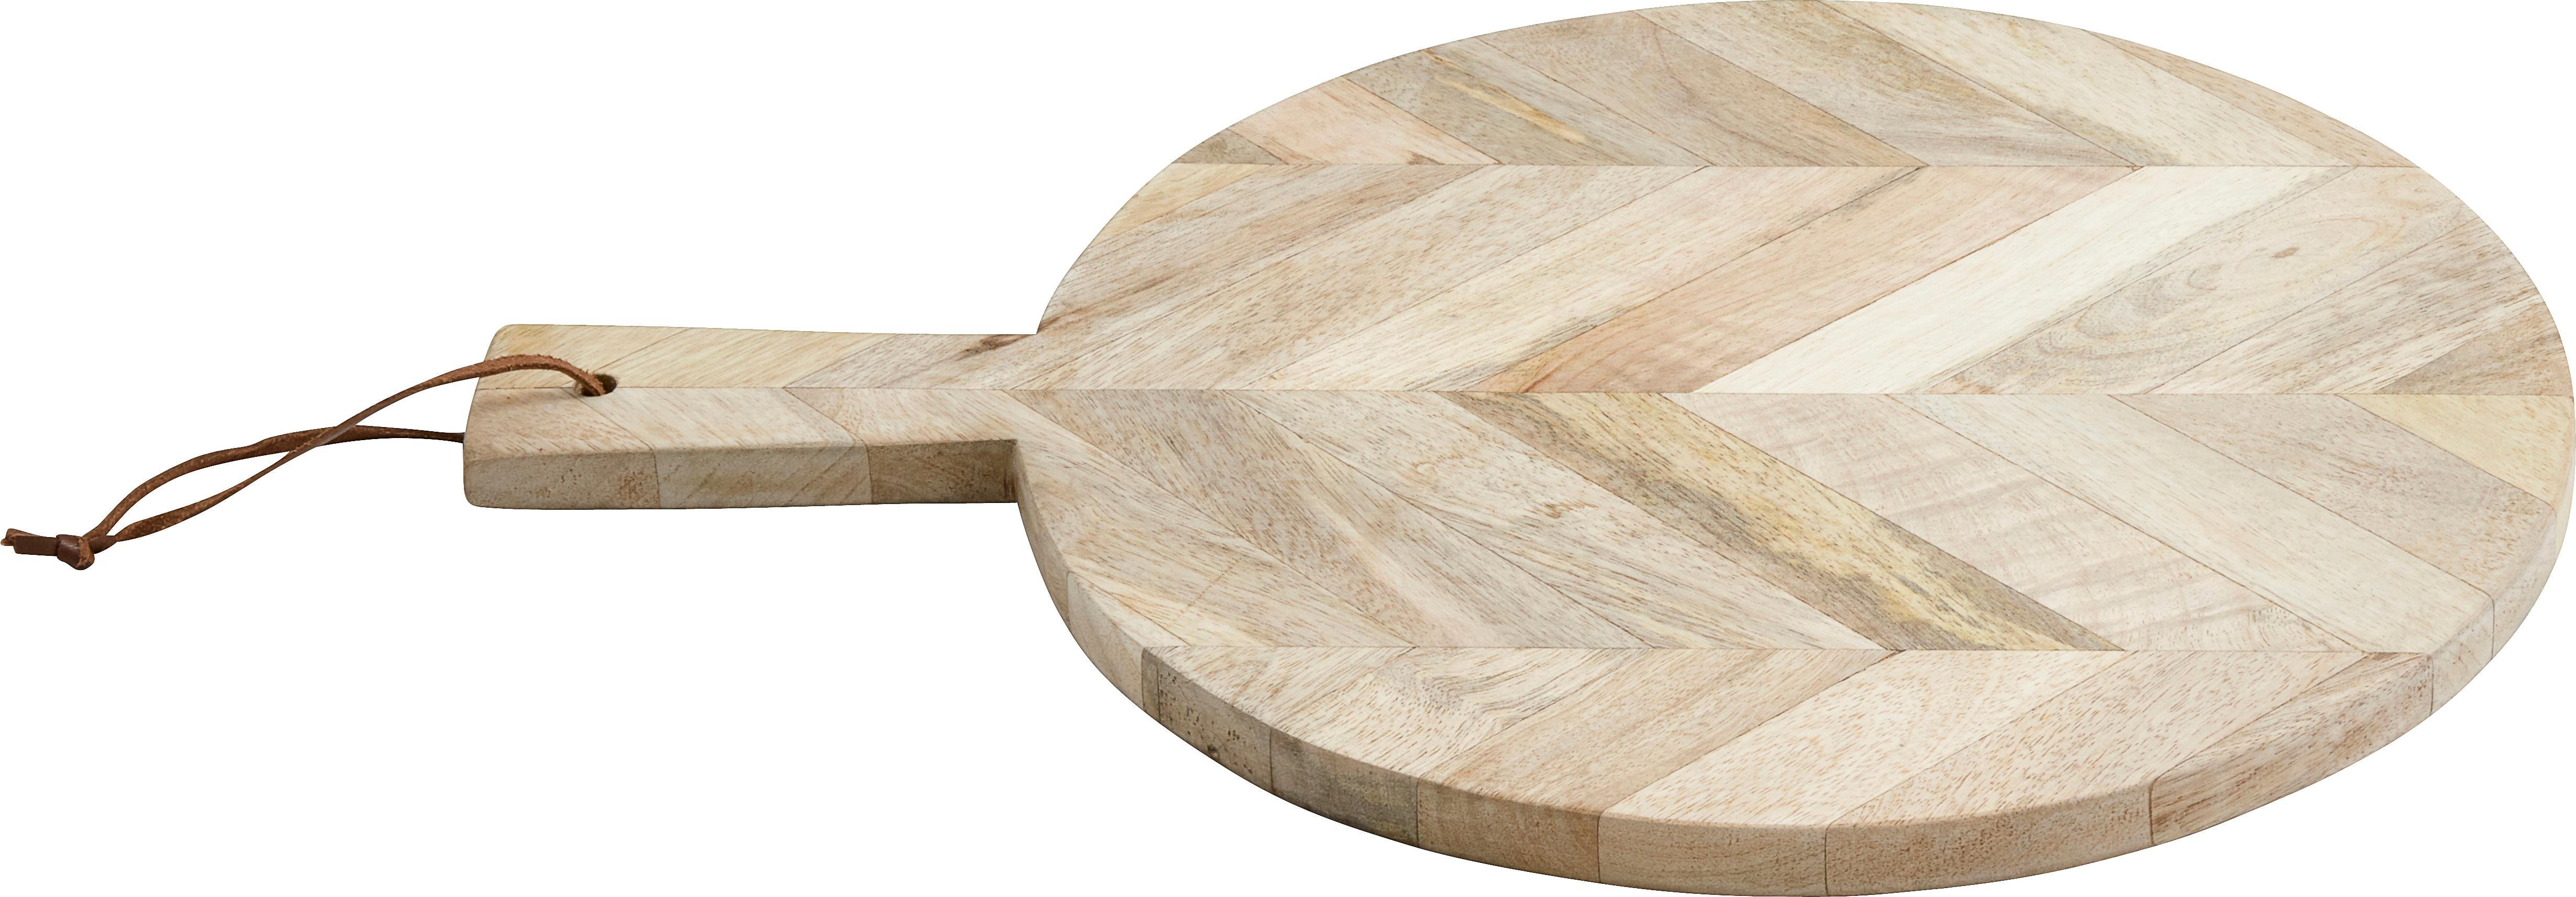 Snijplank Herringbone, Mangohout, leer, Mangohout, B 43 x D 32 cm